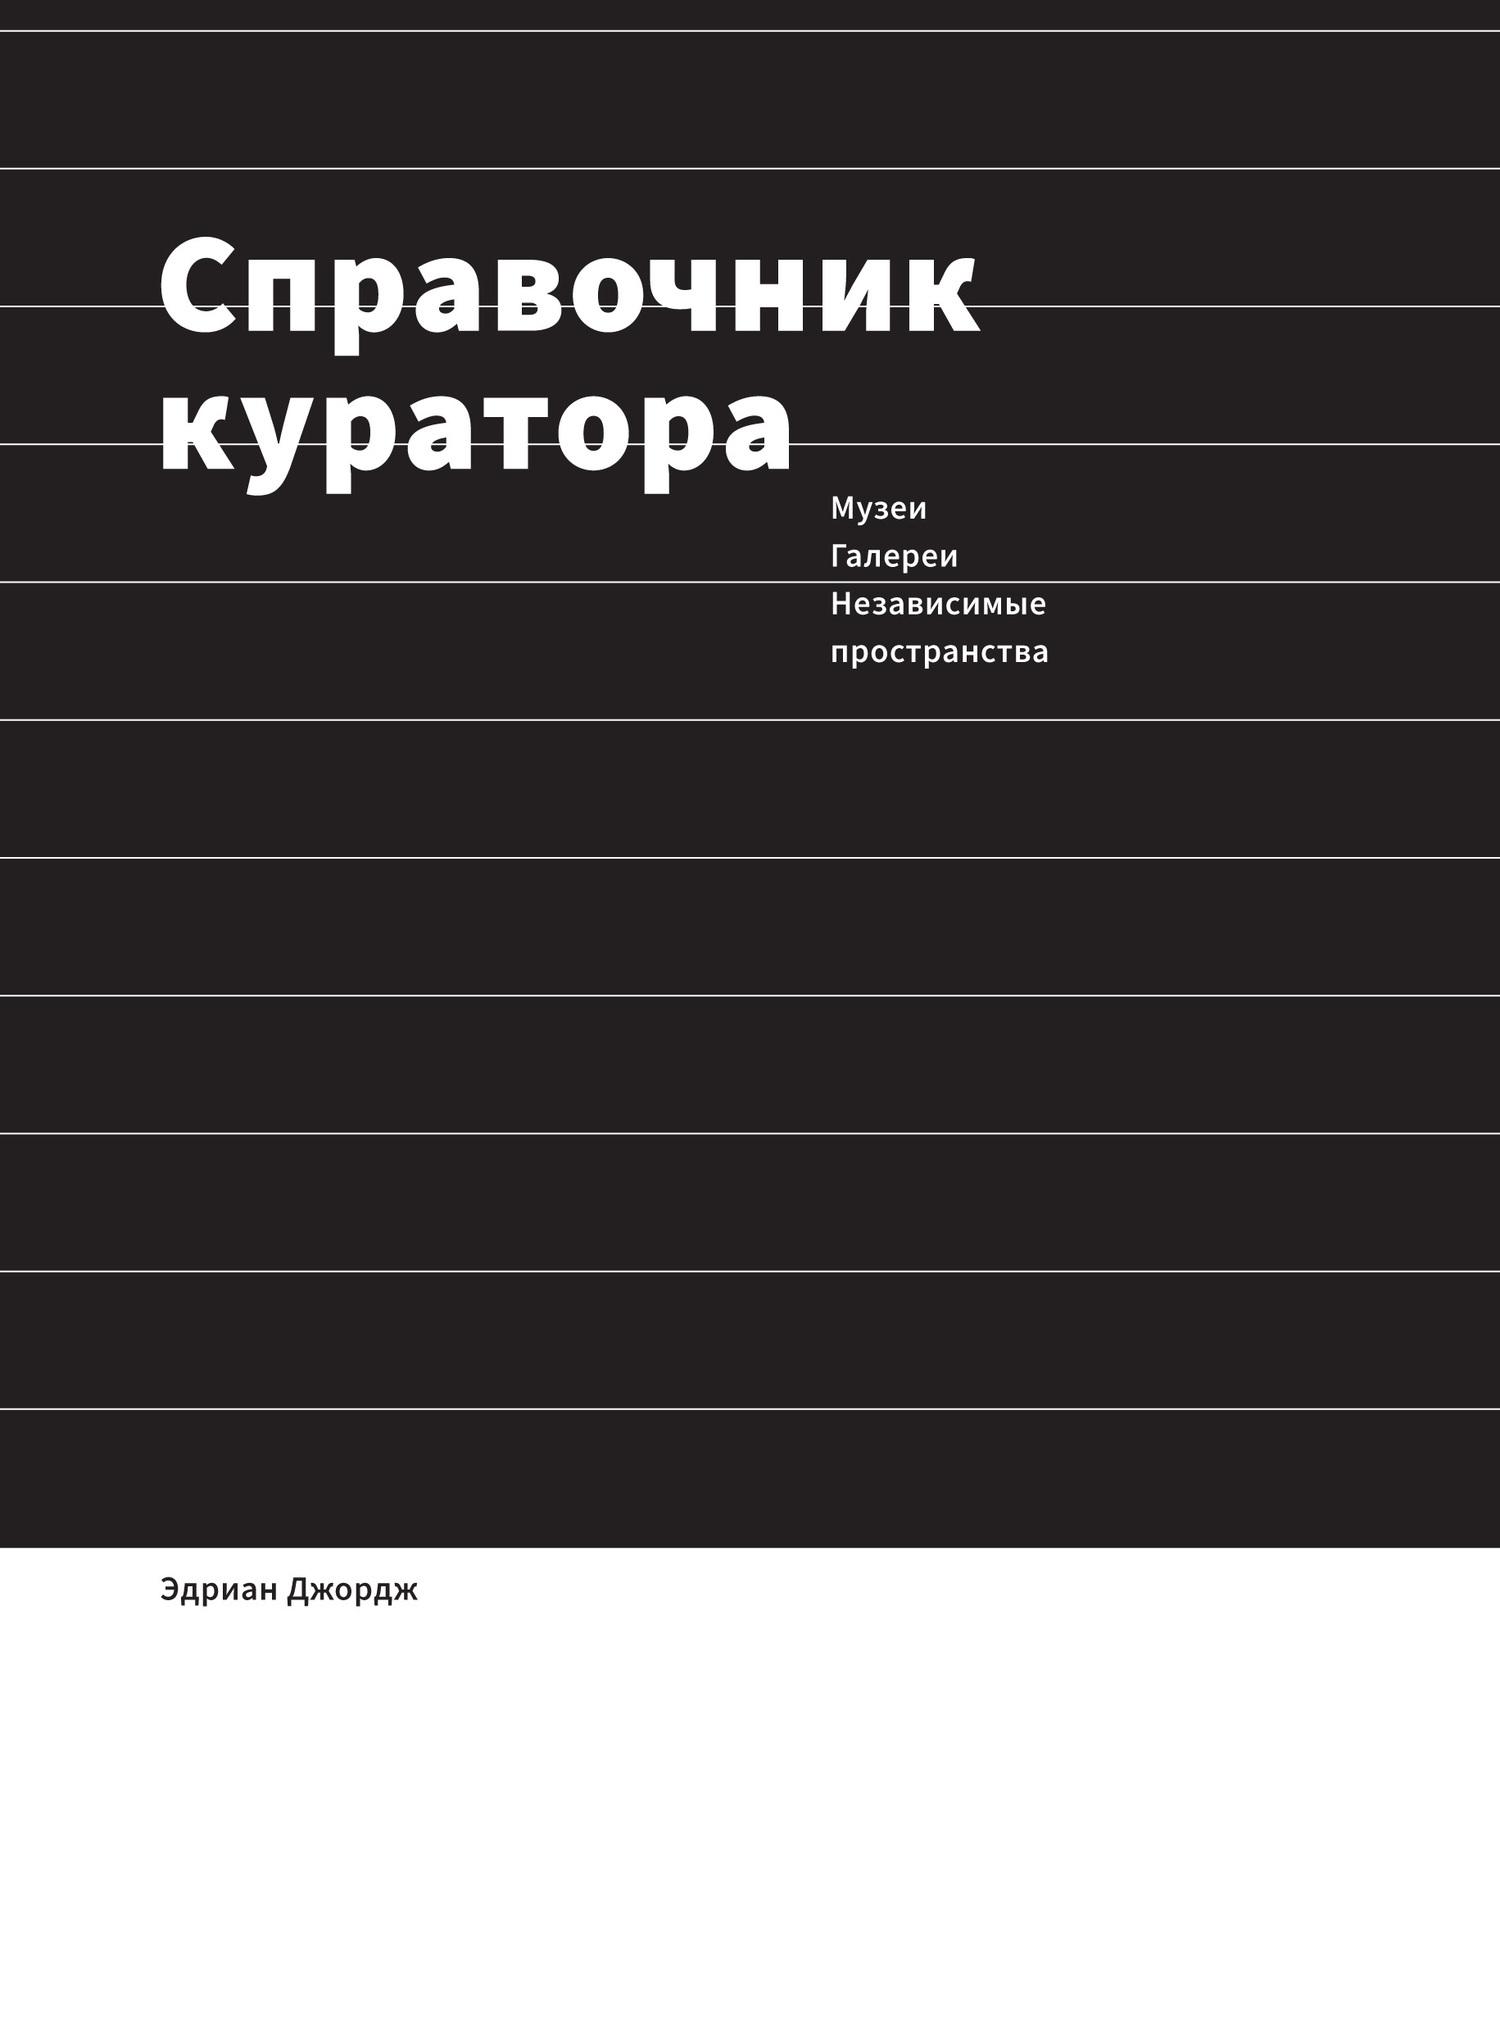 Справочник куратора. Музеи, галереи, независимые пространства